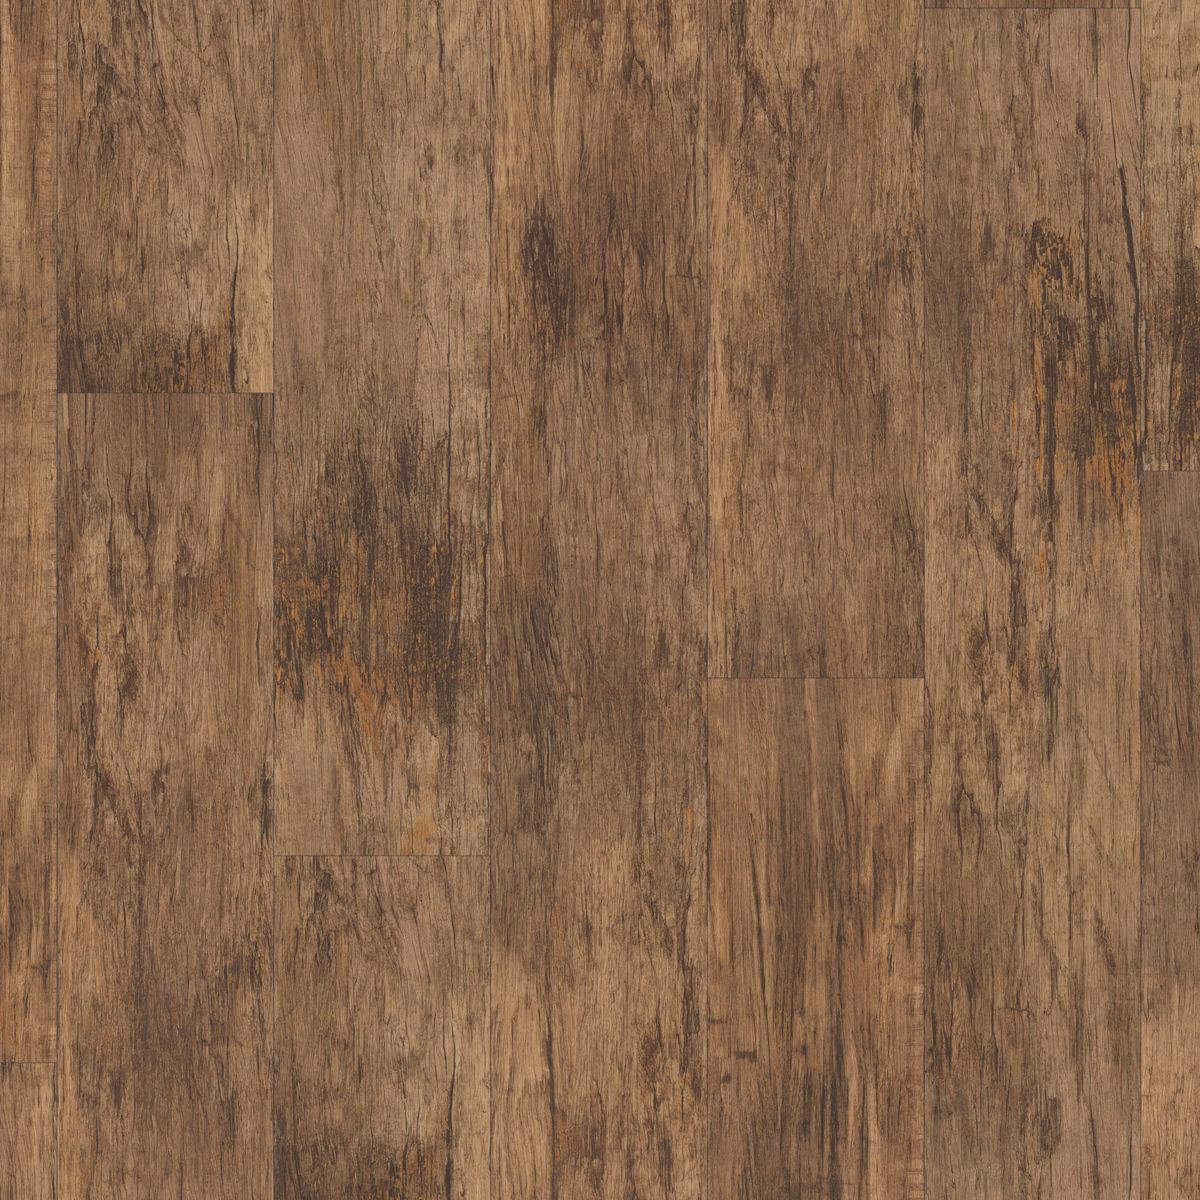 Karndean Van Gogh Bracken Vg1 7 Vinyl Flooring